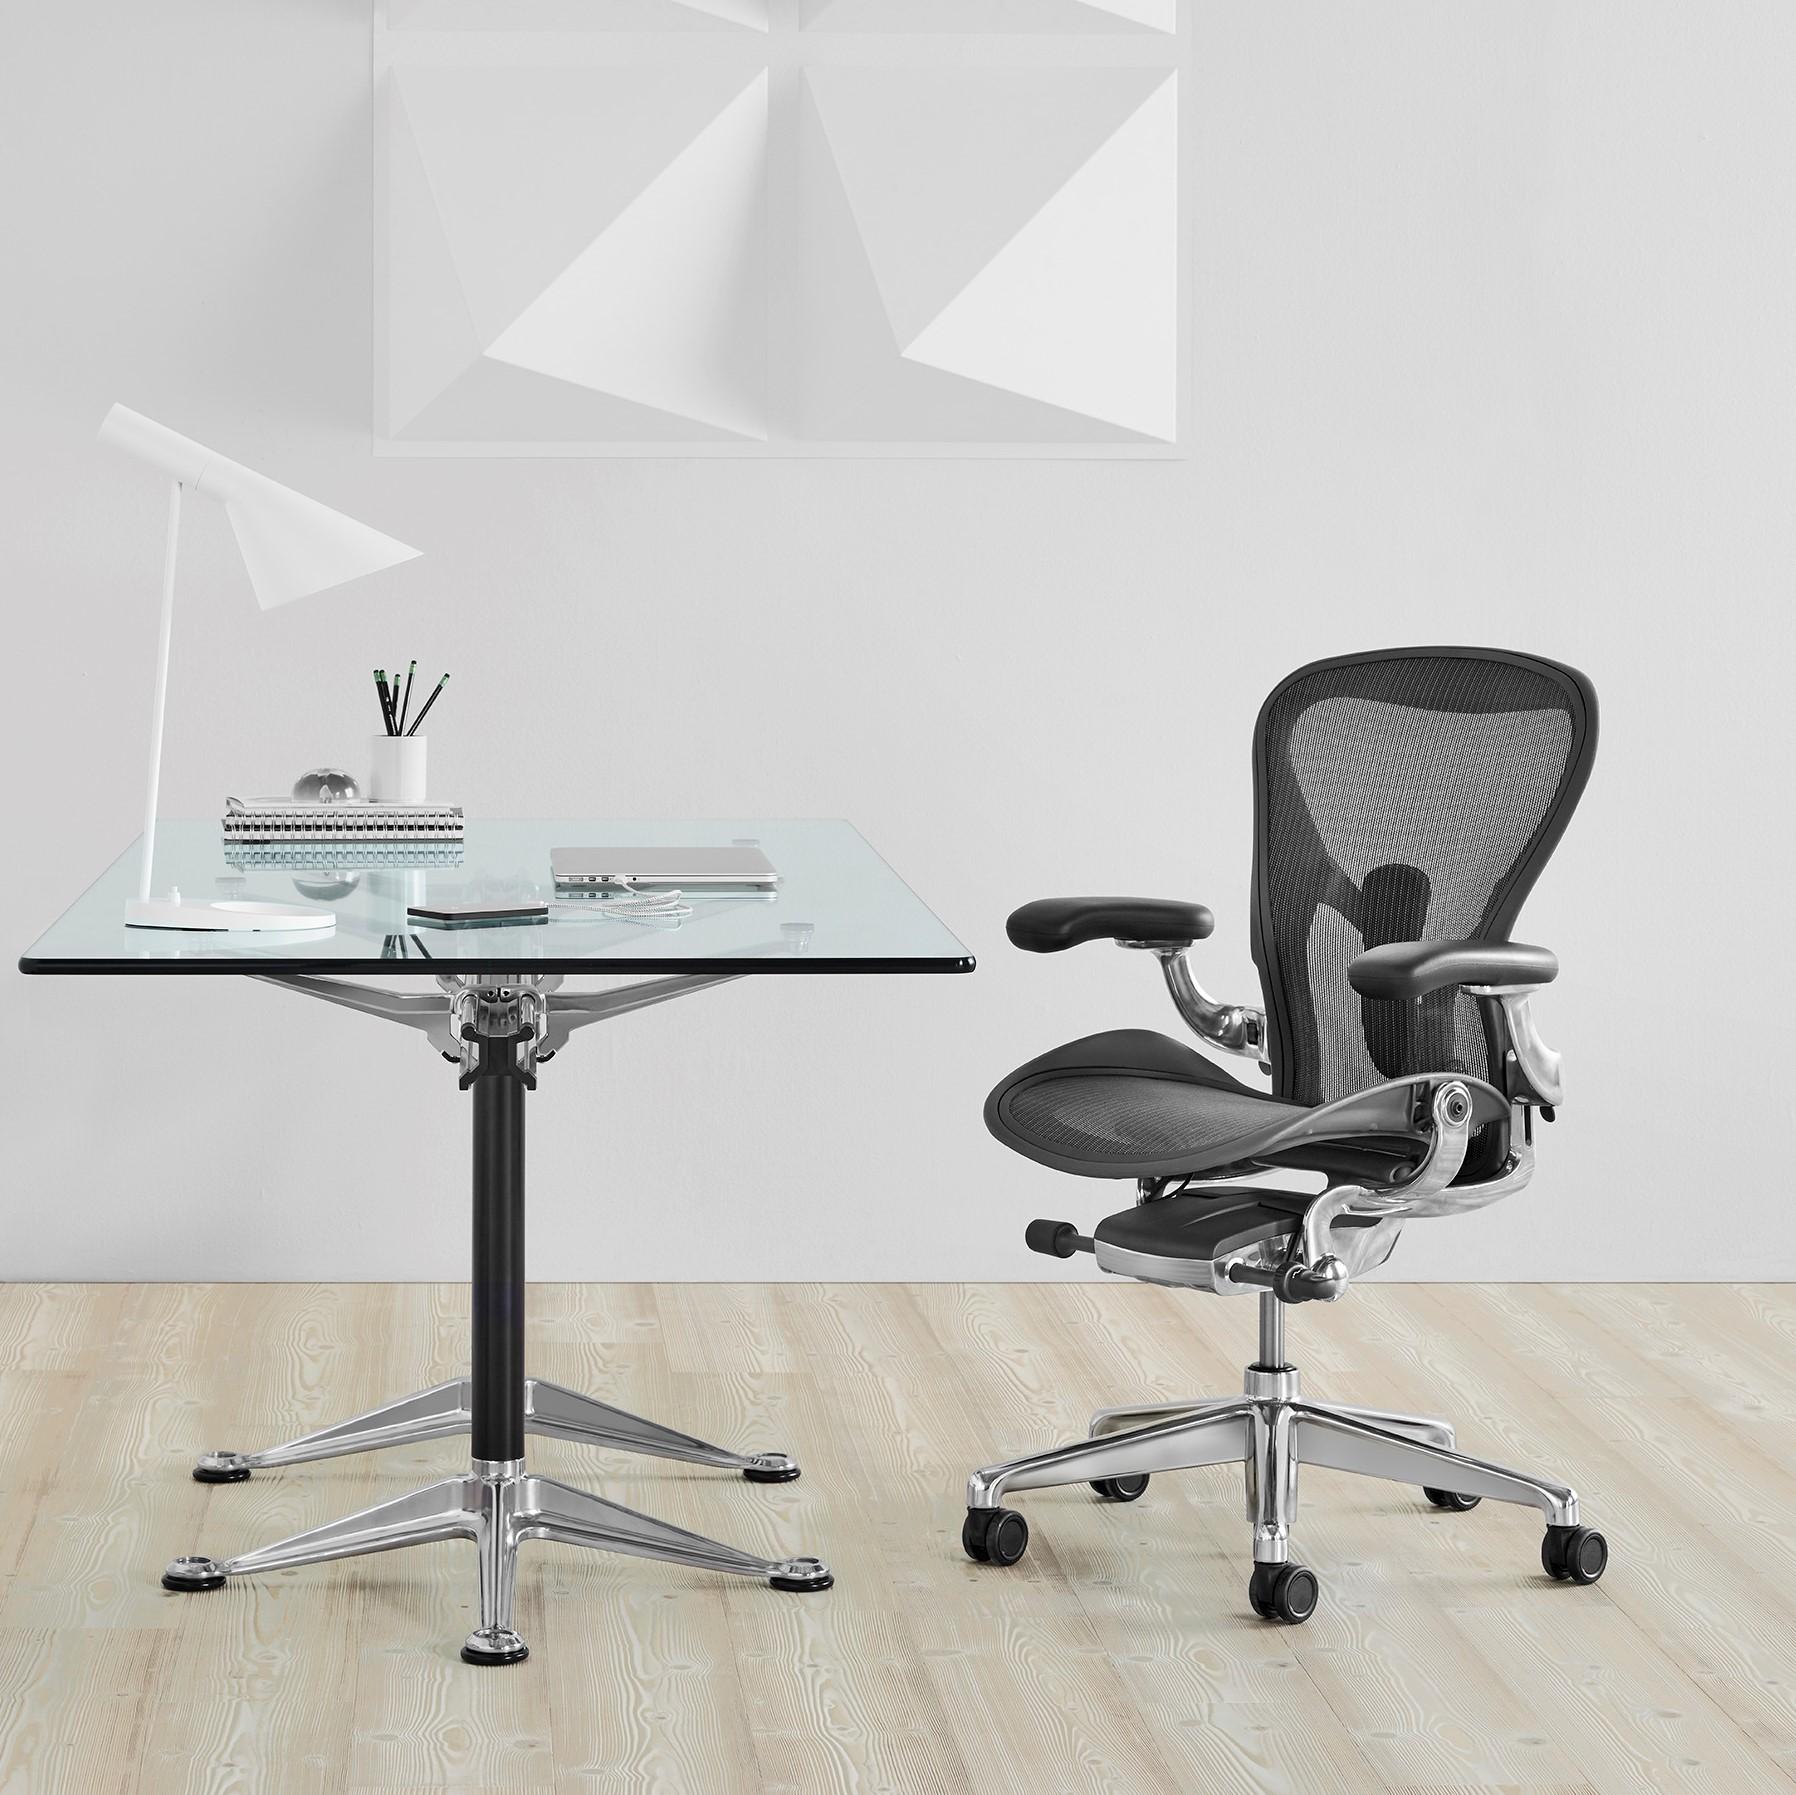 Cadeira ergonómica HERMAN MILLER AERON - Agile Design Store